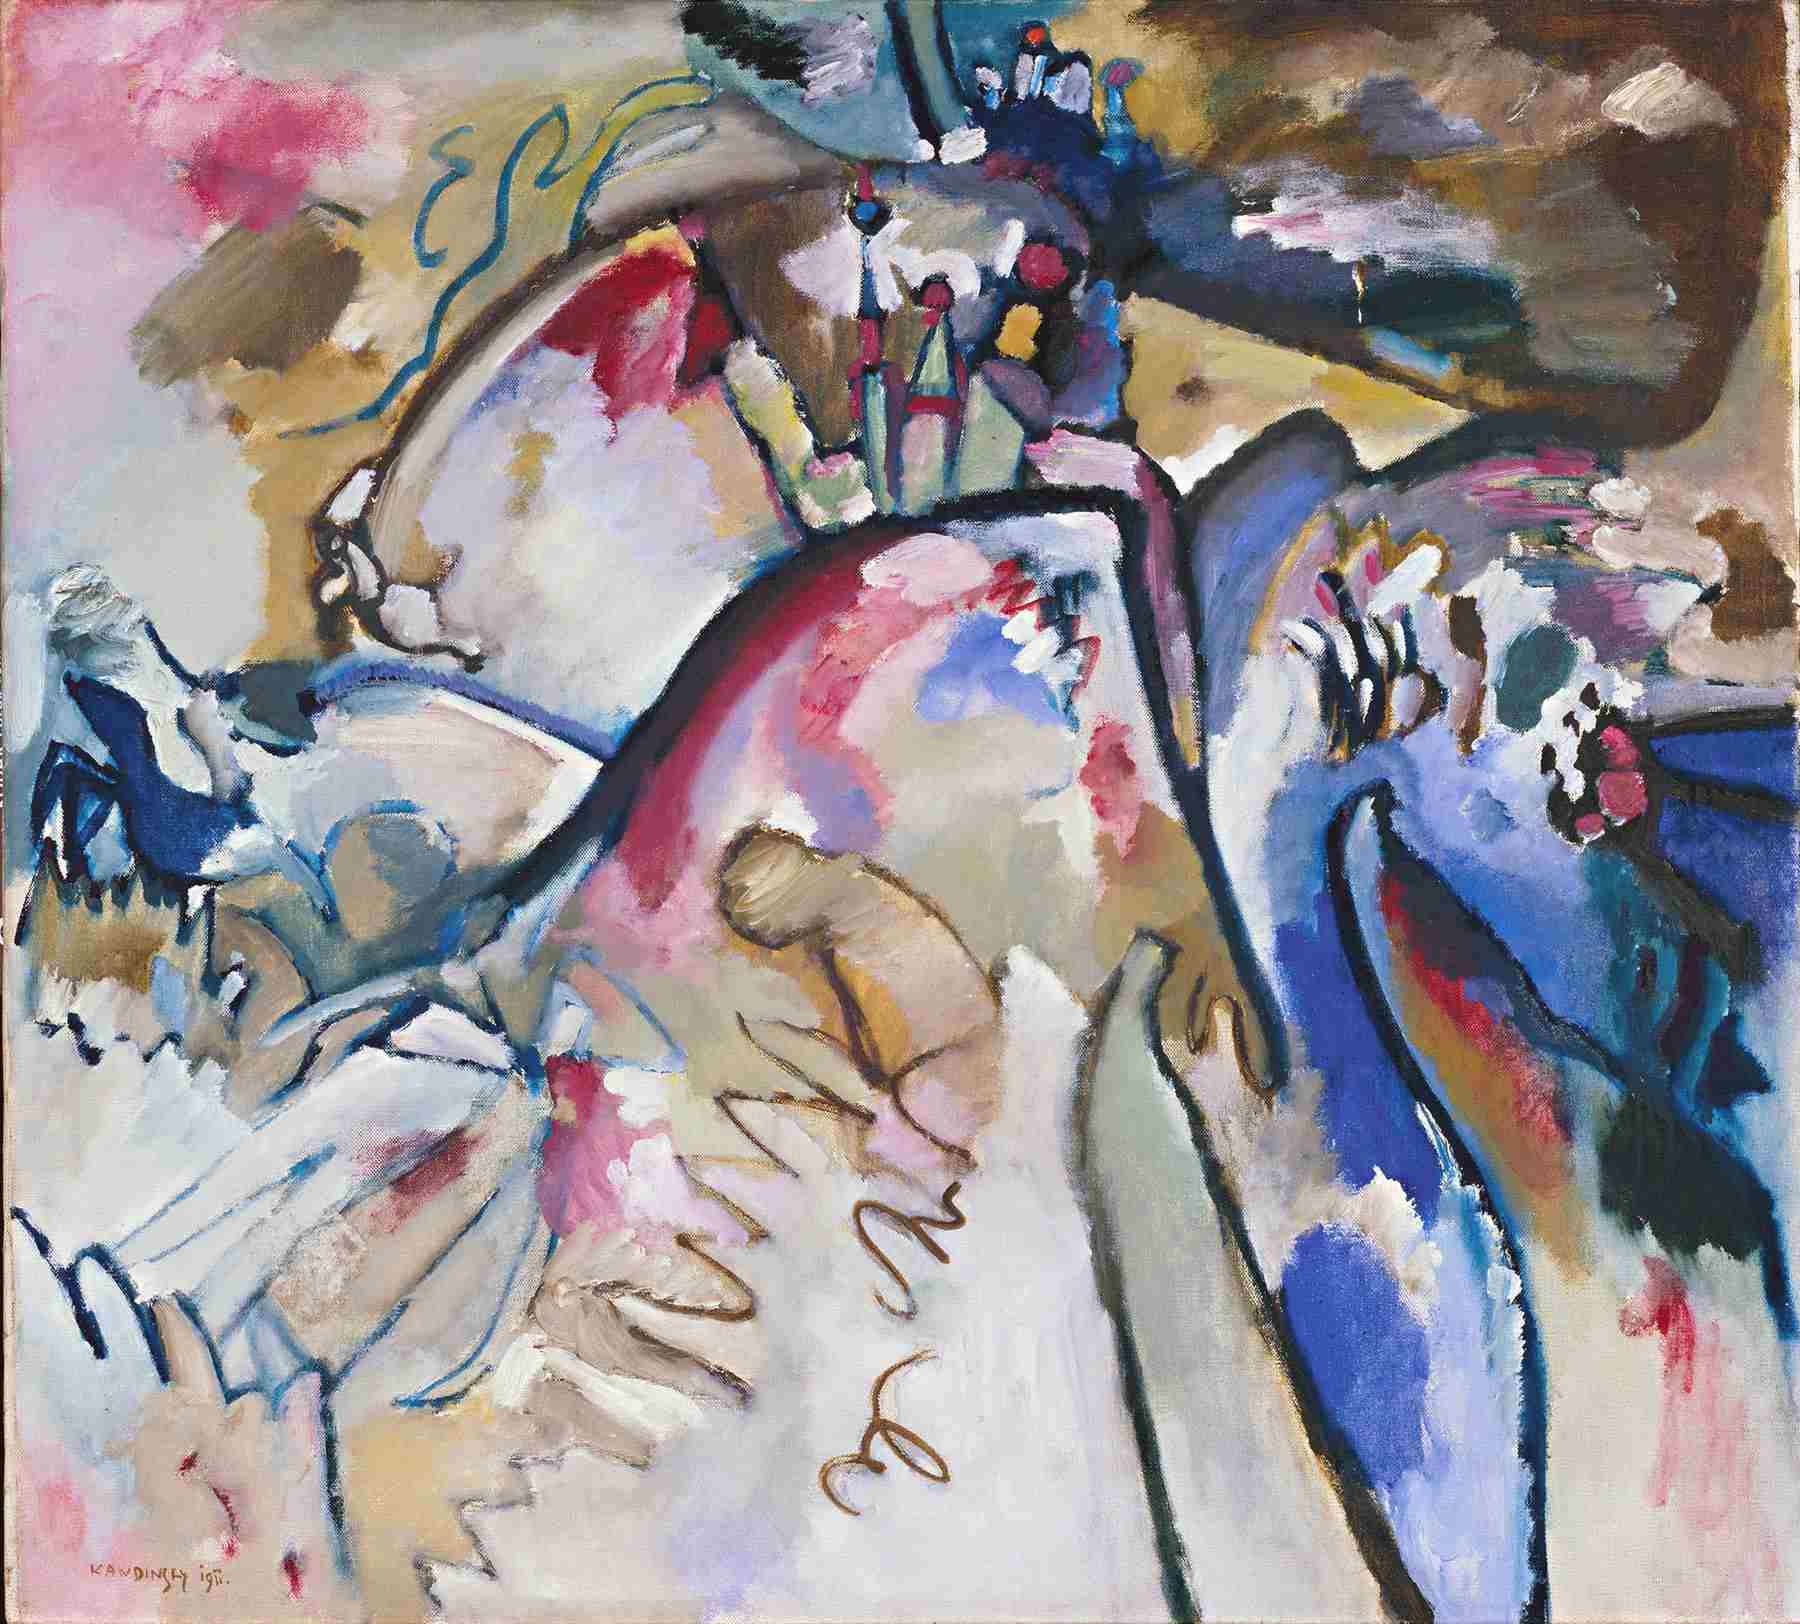 Wassily Kandinsky (Russian, 1866-1944) Wassily Kandinsky (Russian, 1866-1944). Improvisation 21A, 1911. Oil and tempera on canvas. 37 3/4 x 41 5/16 in. (96 x 105 cm). Gabriele Münter-Stiftung, 1957. Städtische Galerie im Lenbachhaus, Munich.